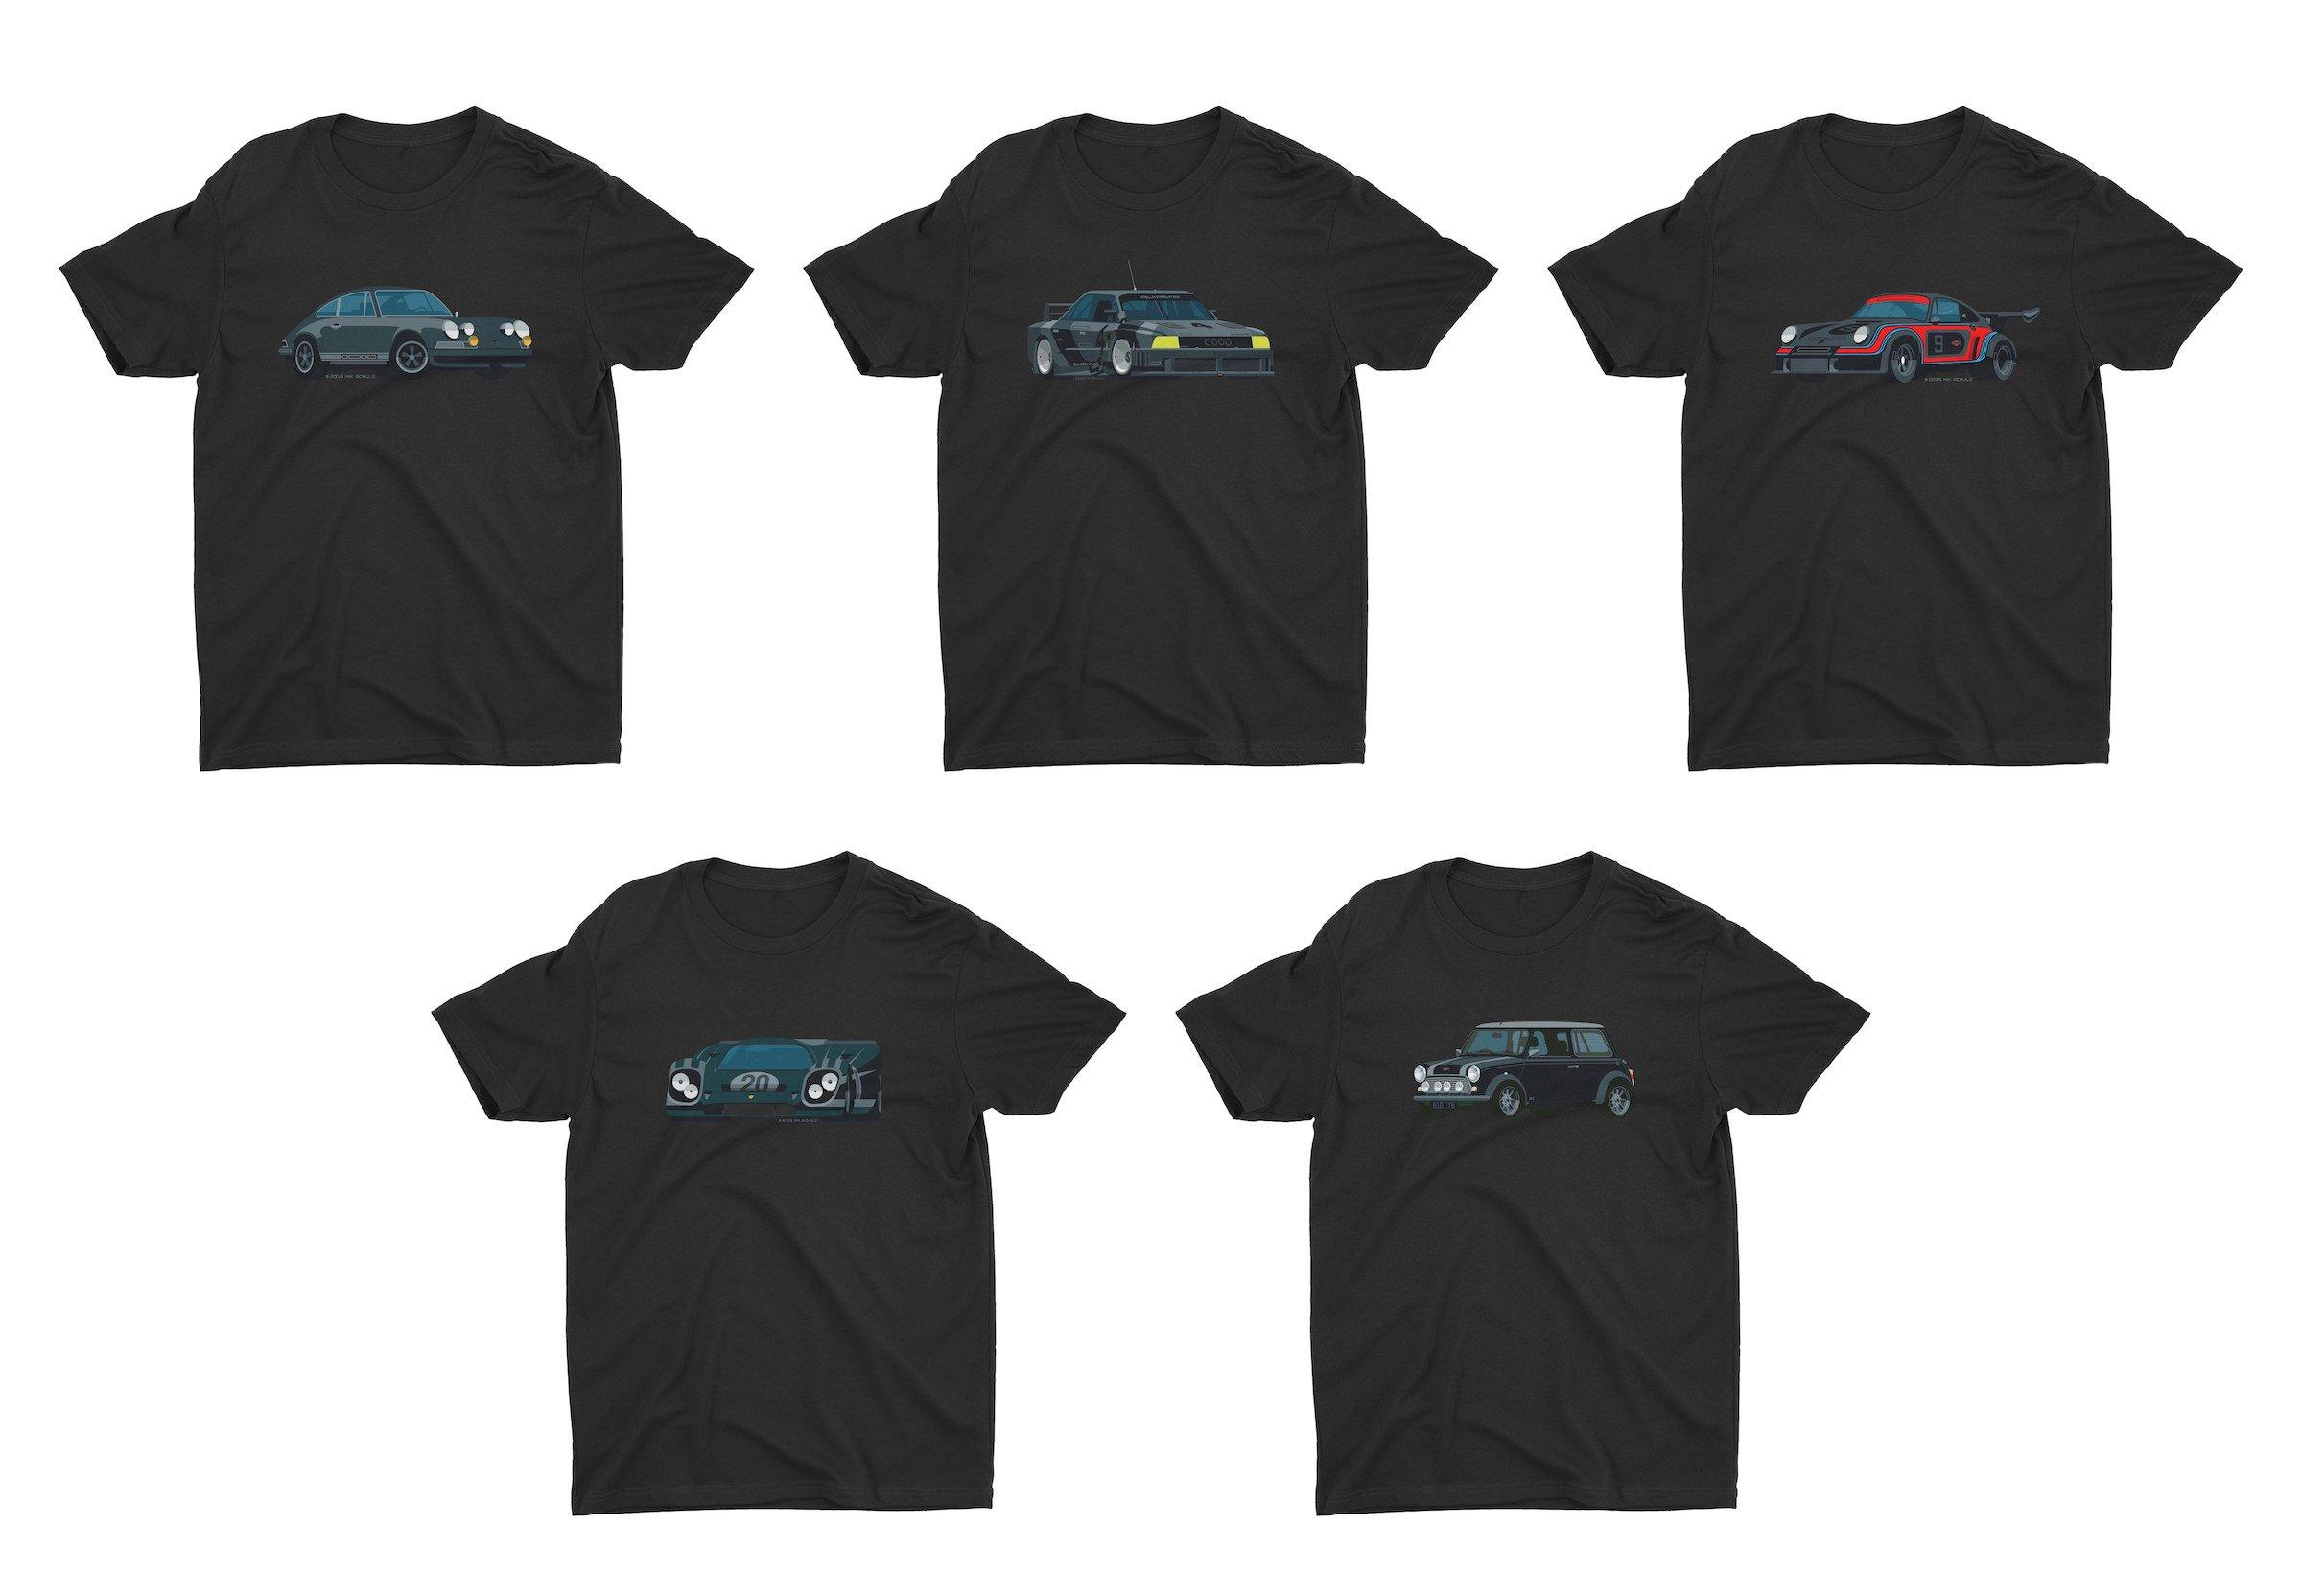 Nik Schultz Car T-Shirt Collage